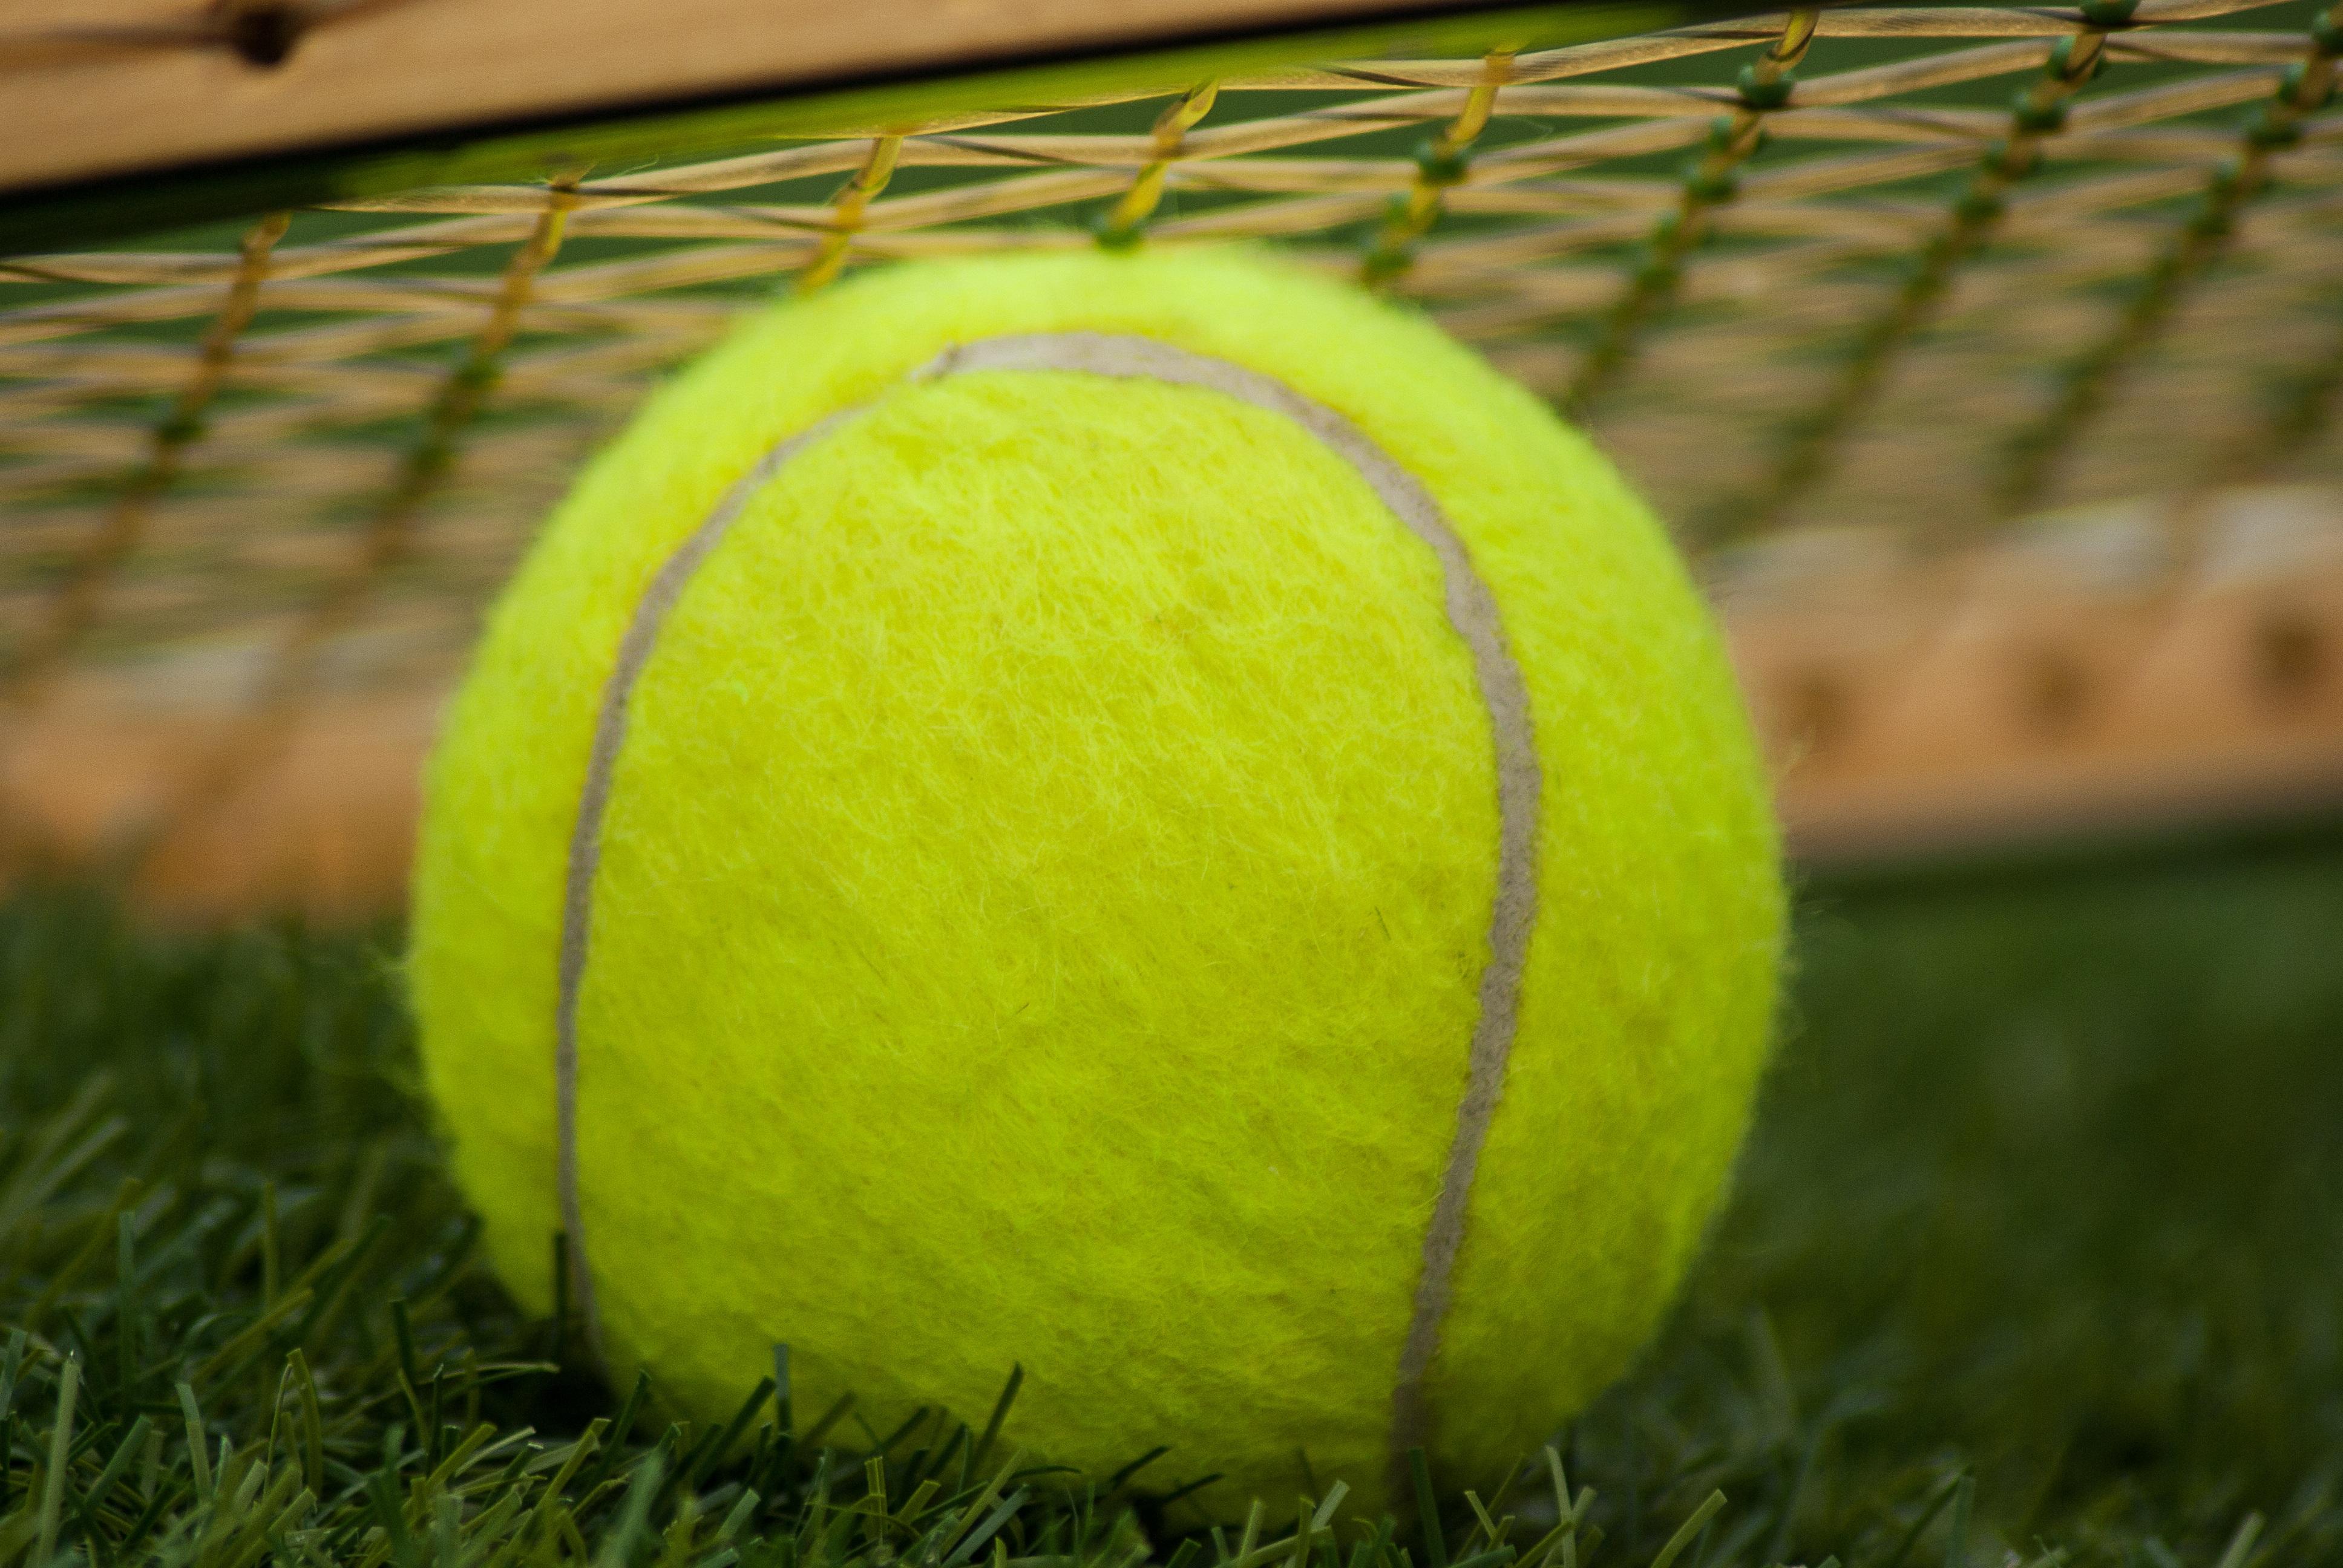 346e040d Bildet : gress, sport, grønn, gul, sportsutstyr, tennis, nett, ball ...